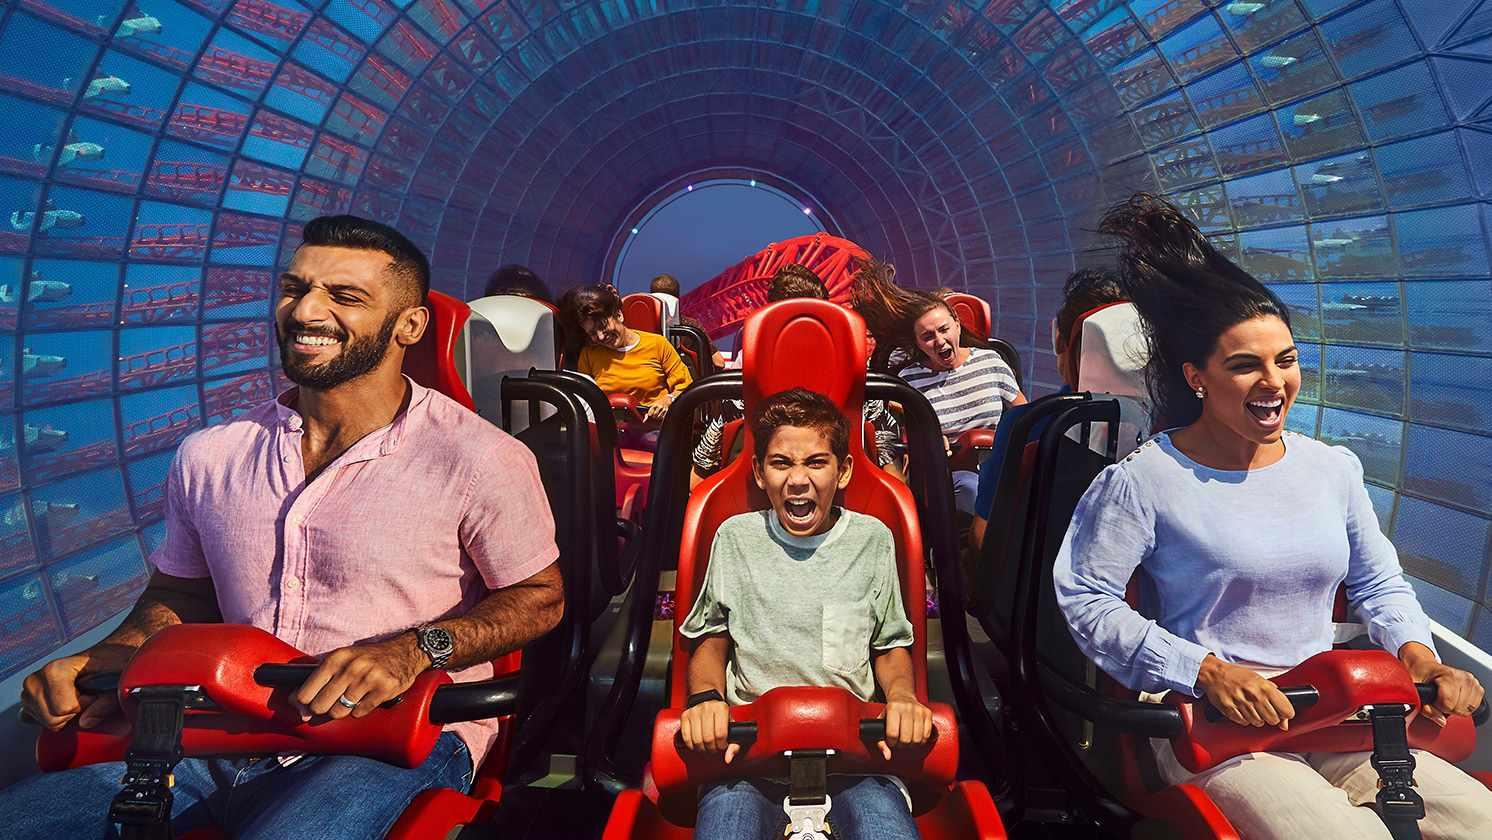 Turbo Track coaster at Ferrari World Abu Dhabi